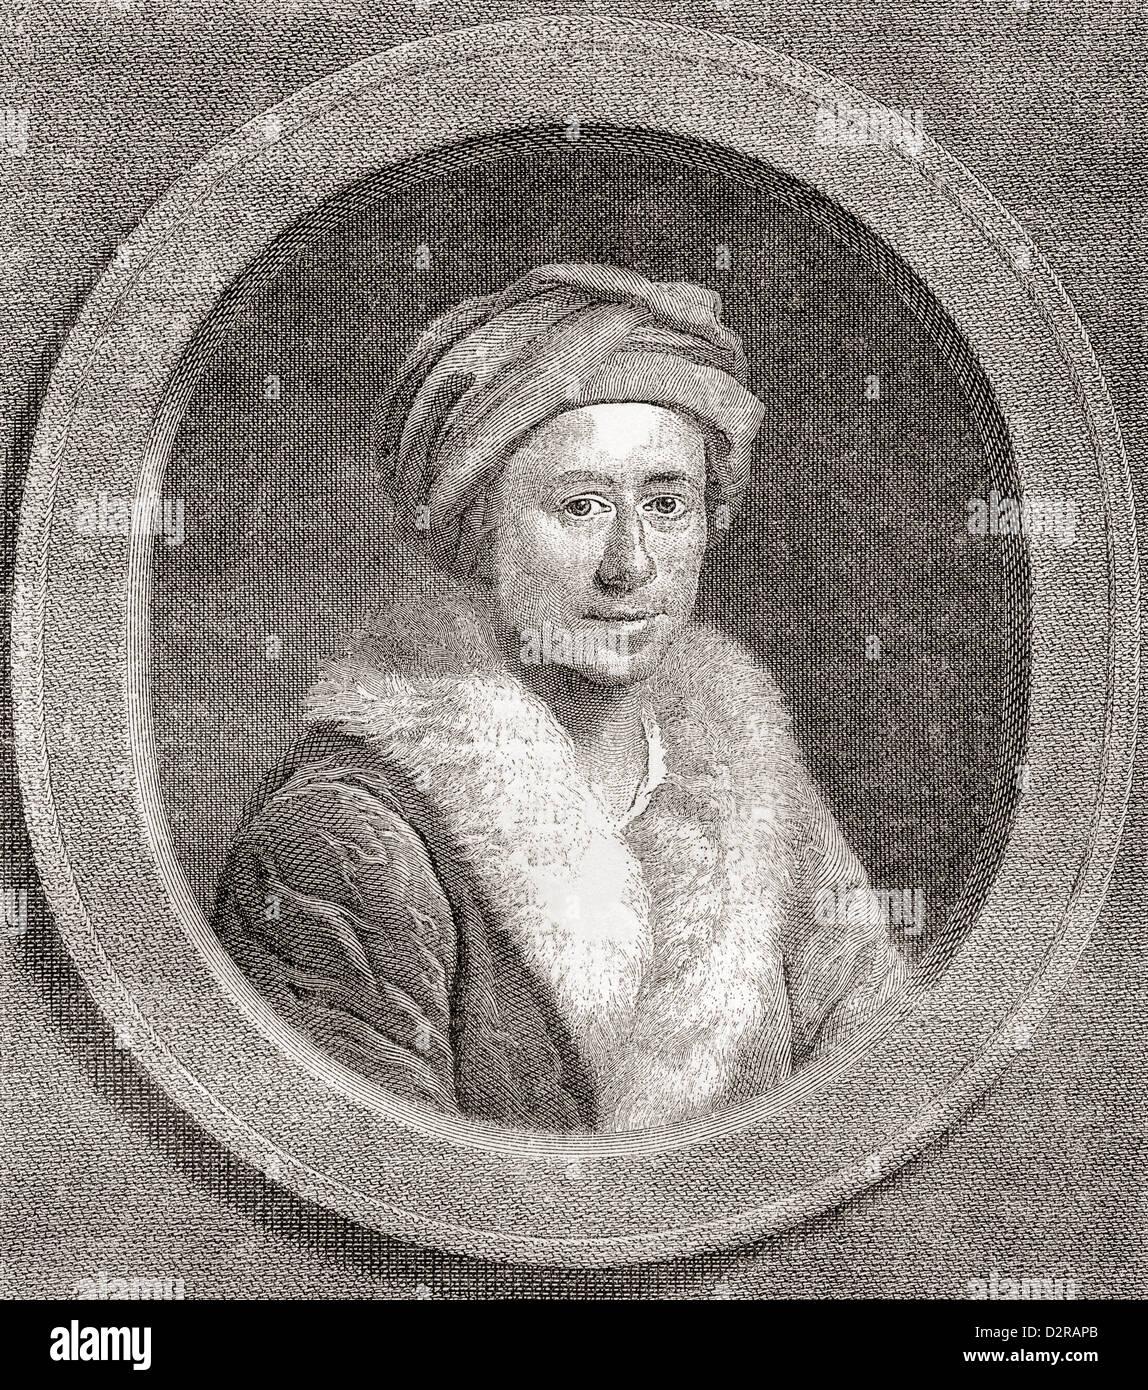 johann winkelmann An exploration of debates that arose over the work of the art historian johann joachim winckelmann between his death in 1768 and the end of the century.